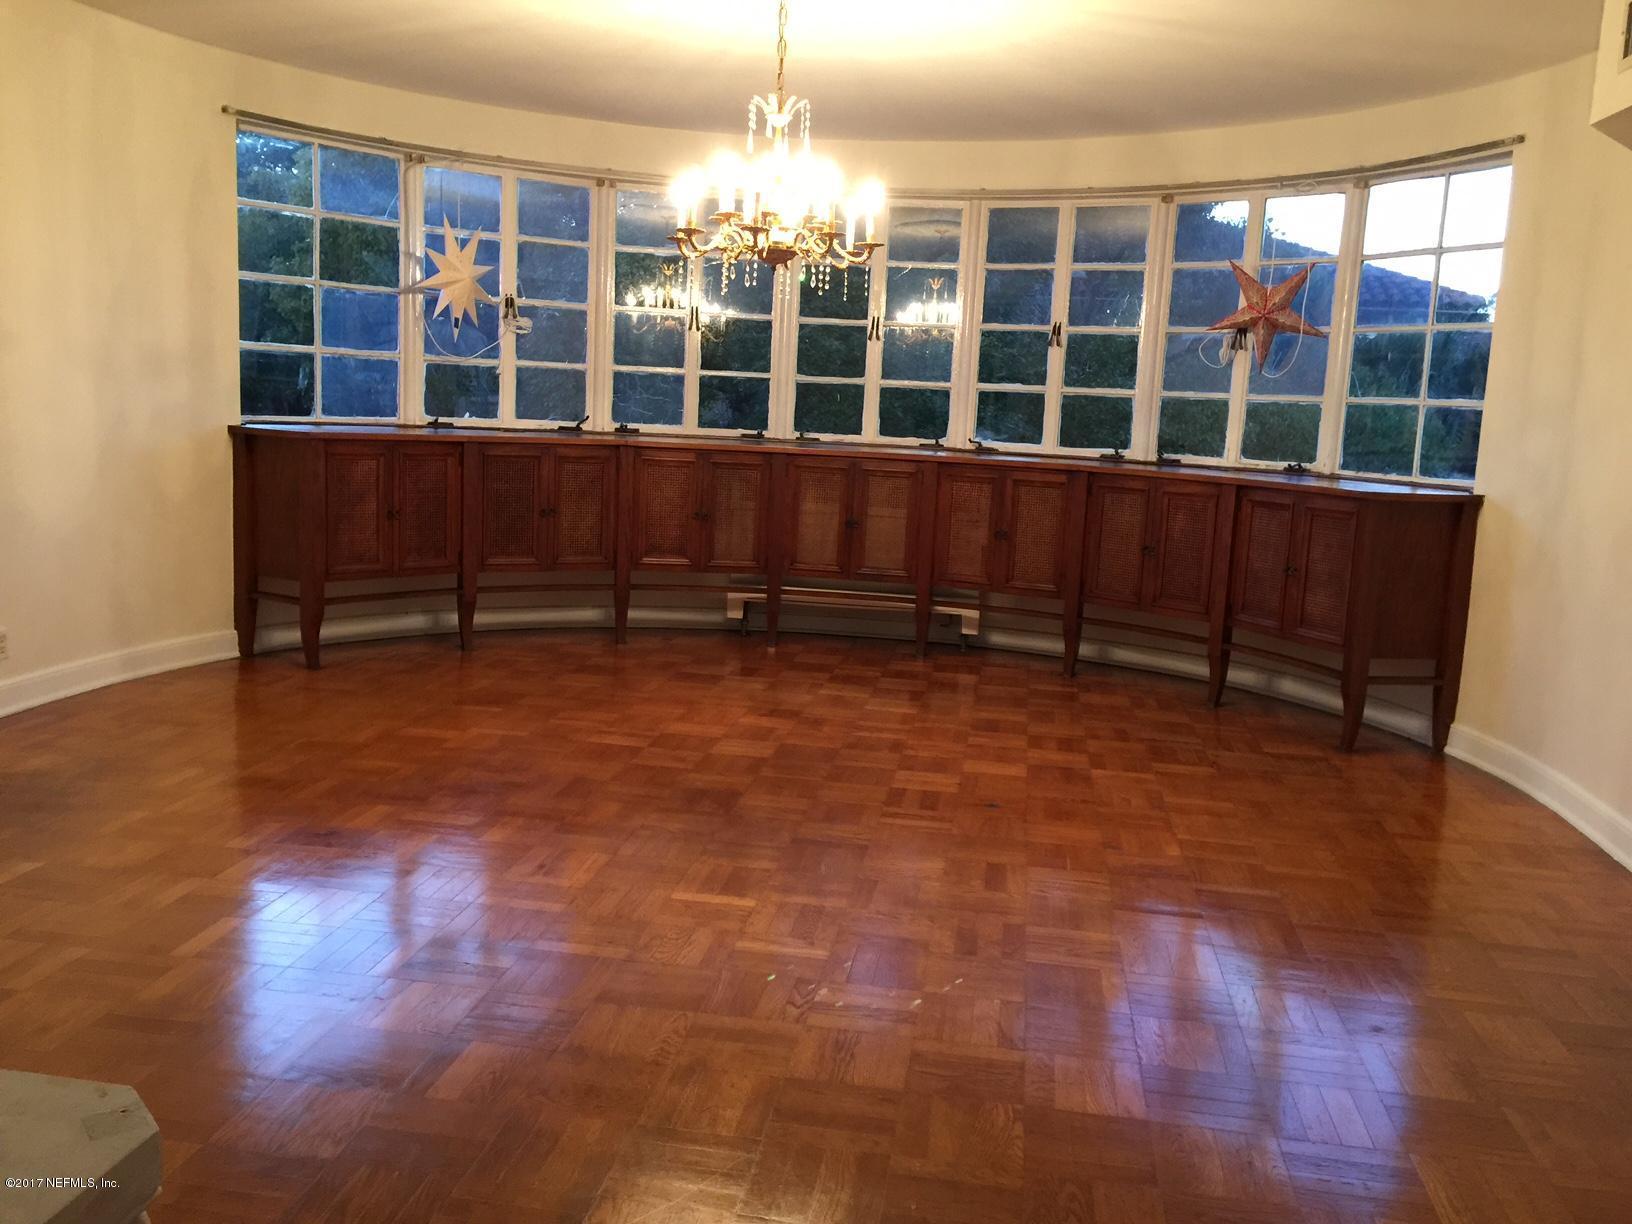 1815 LARGO, JACKSONVILLE, FLORIDA 32207, 8 Bedrooms Bedrooms, ,5 BathroomsBathrooms,Investment / MultiFamily,For sale,LARGO,1056108